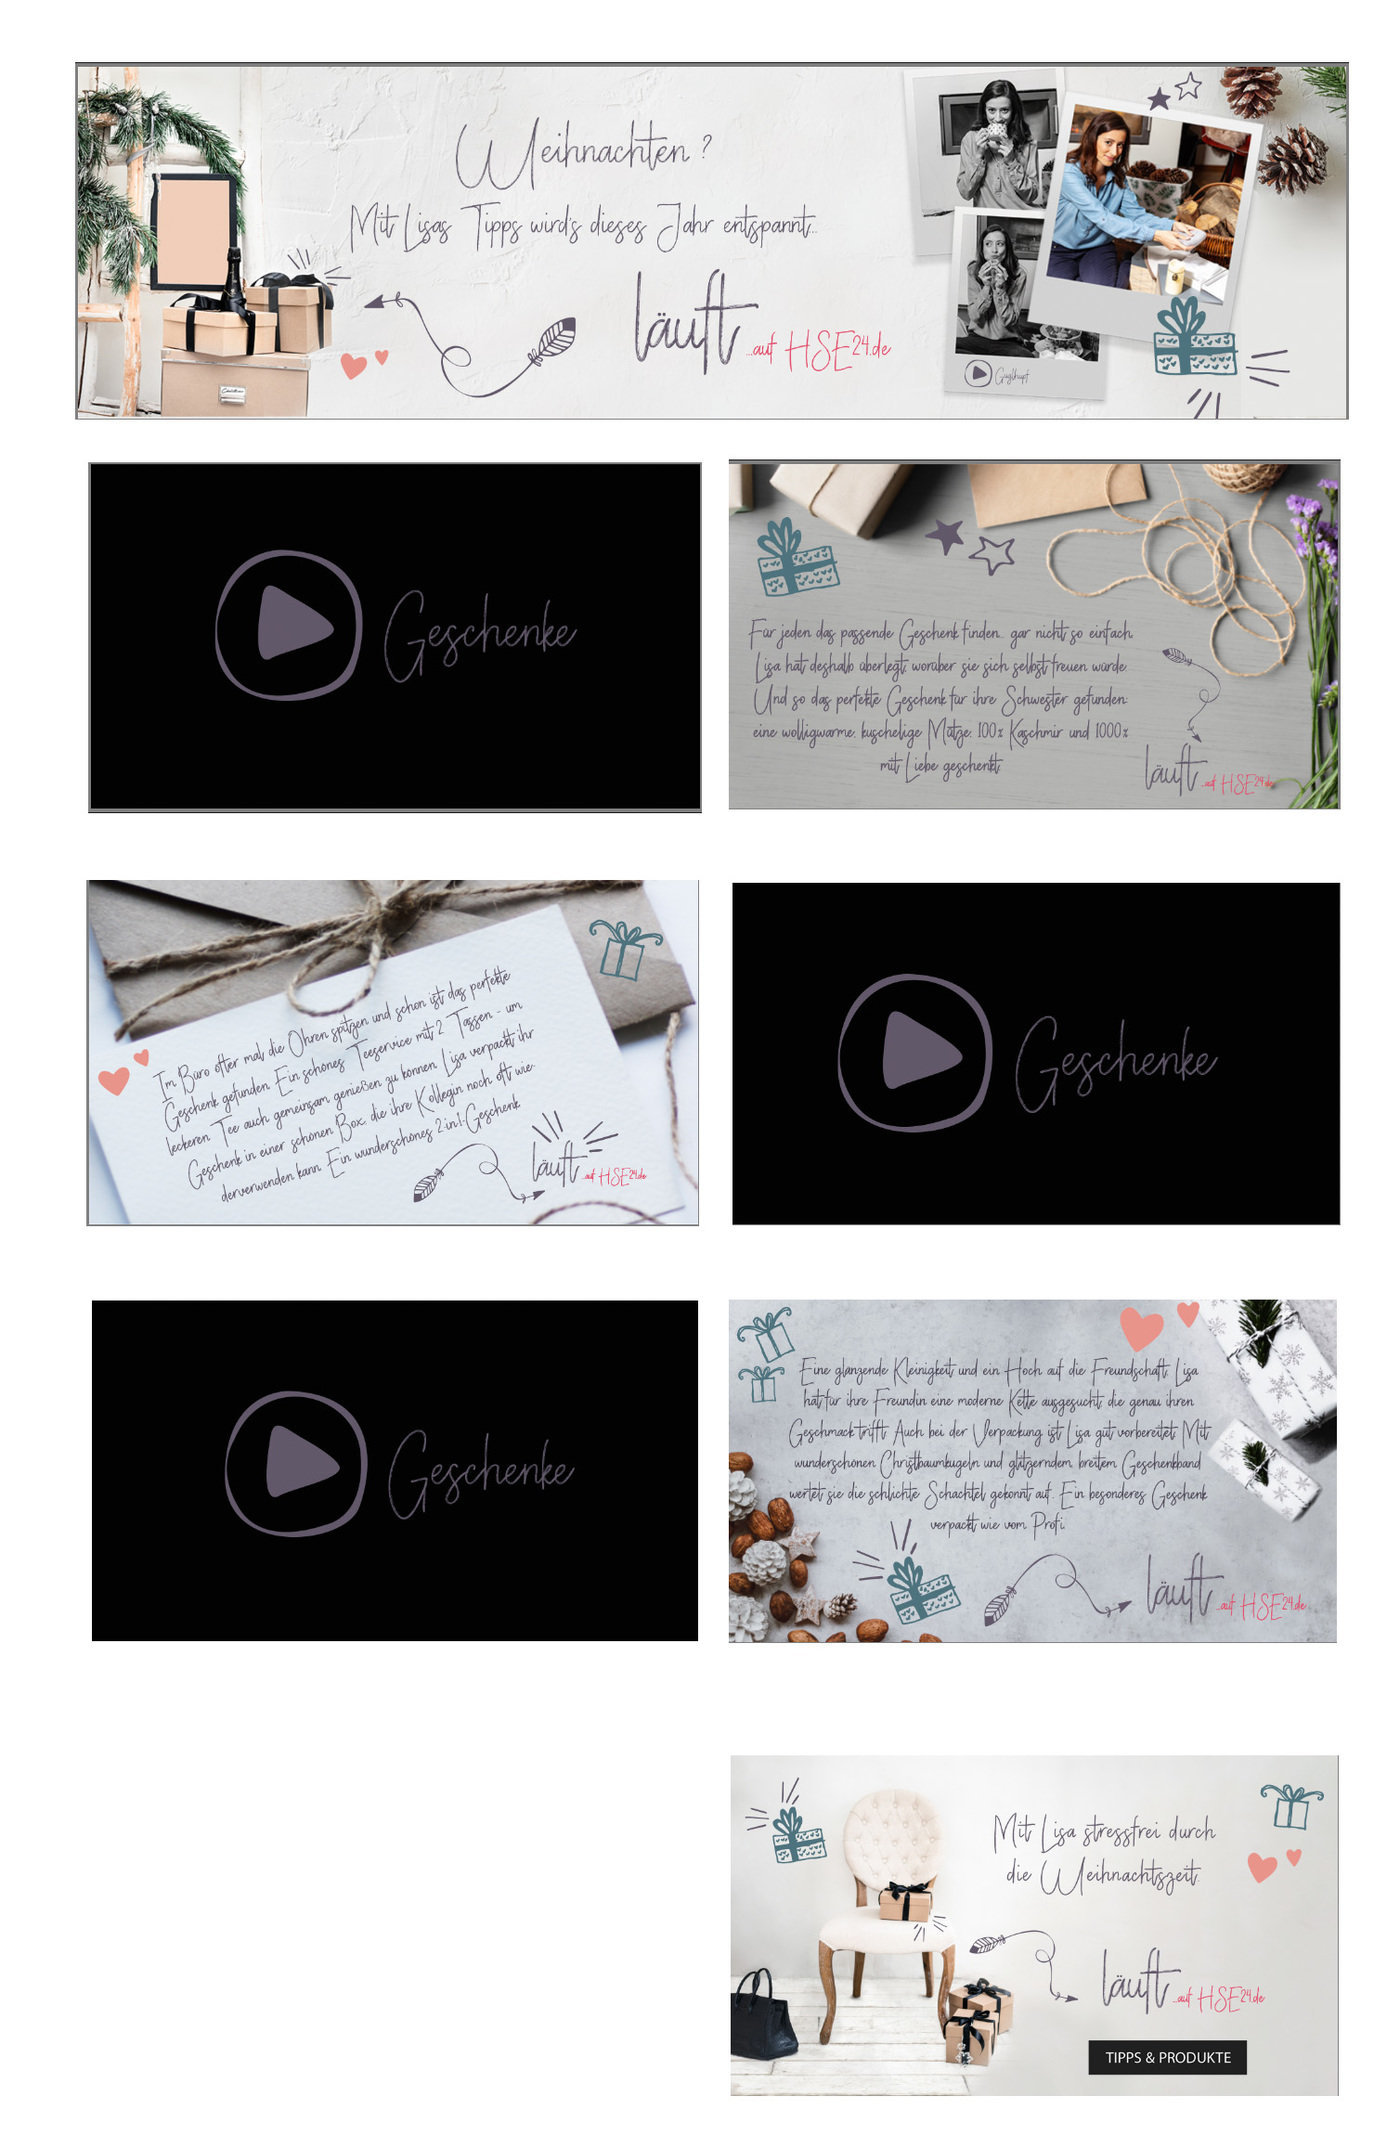 Designer Christbaumkugeln.Online Site By Florence Chaumont At Coroflot Com